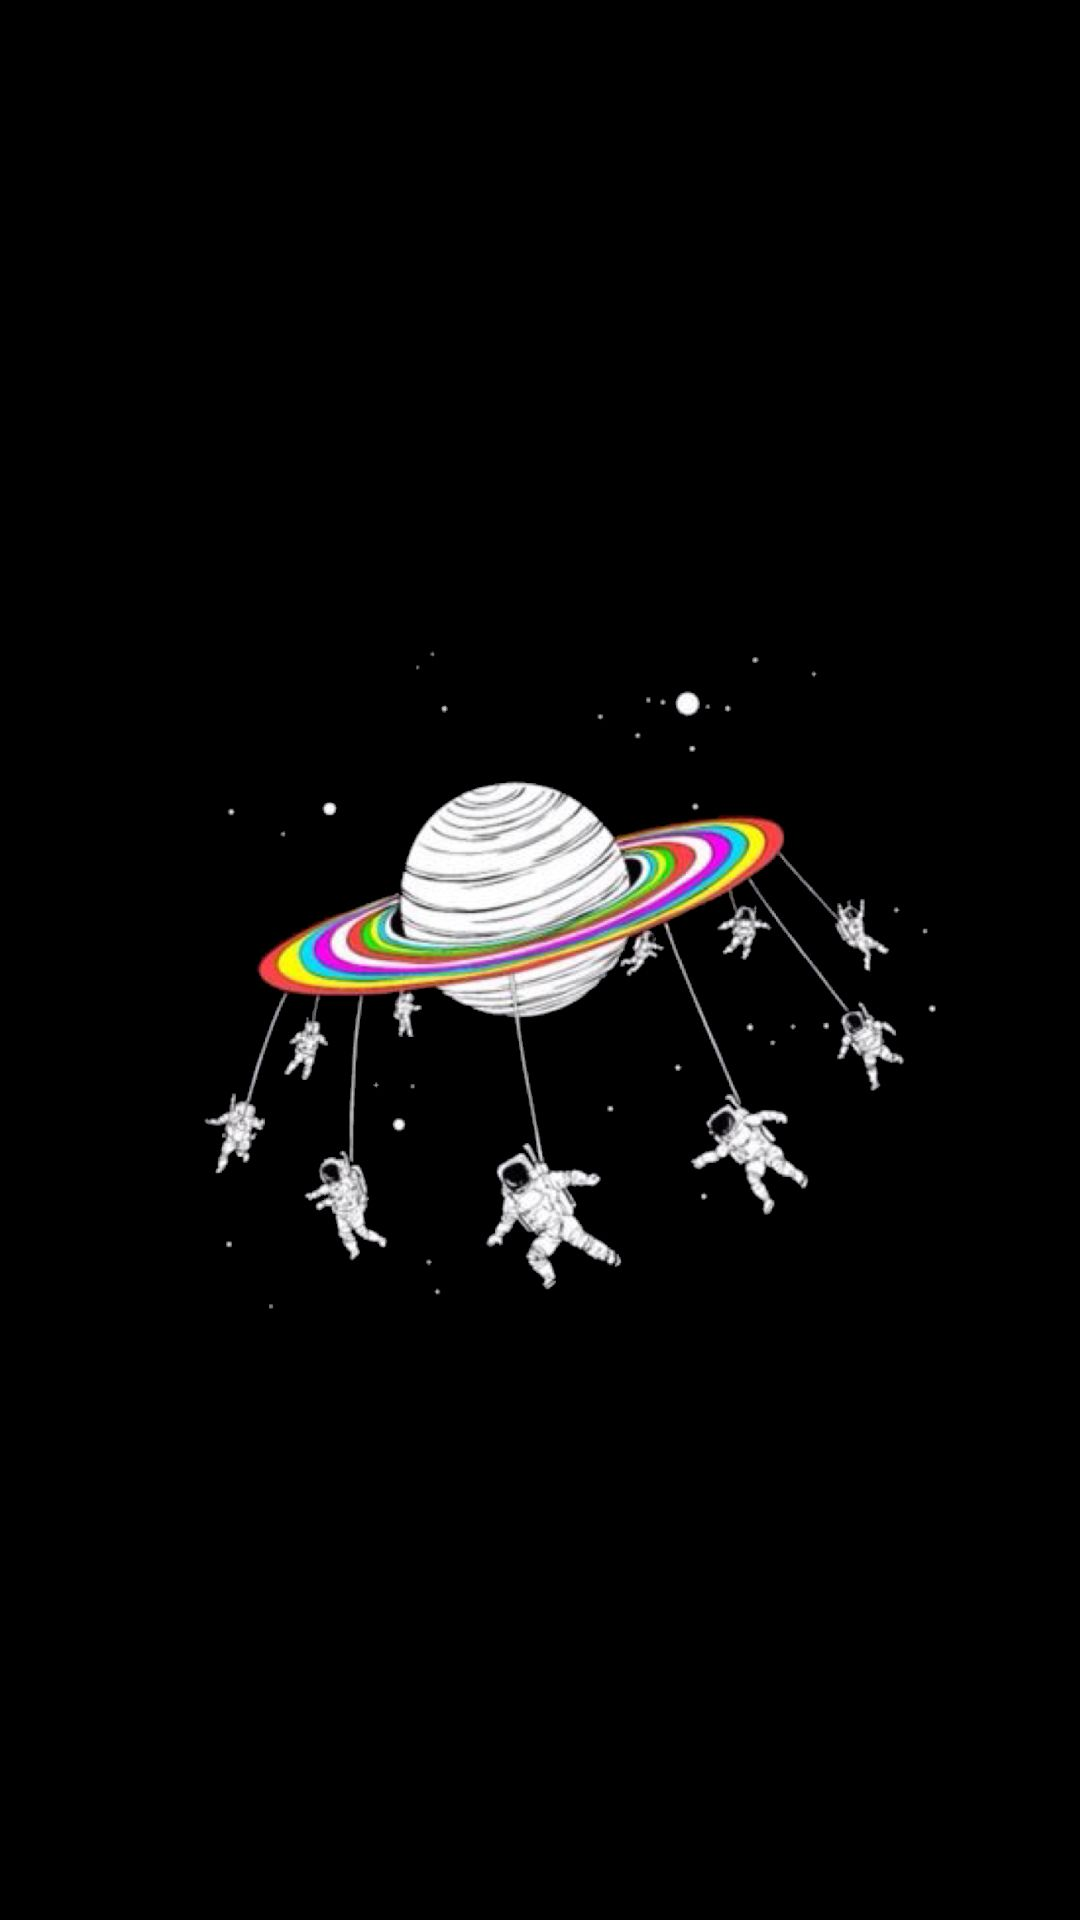 Black White Astronaut Saturn Planets Edgy Trippy Art Love